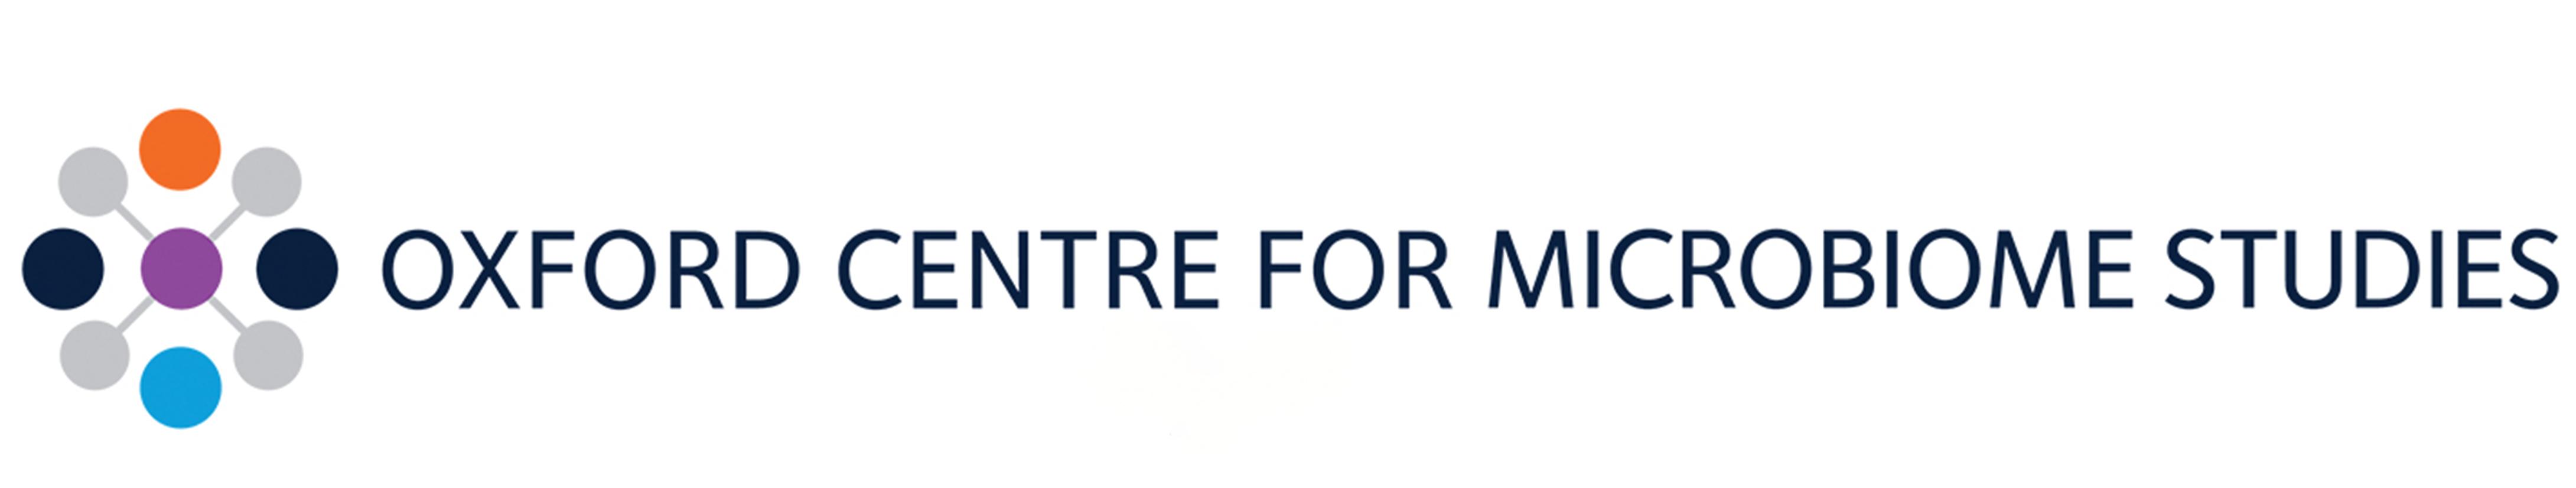 OCMS logo